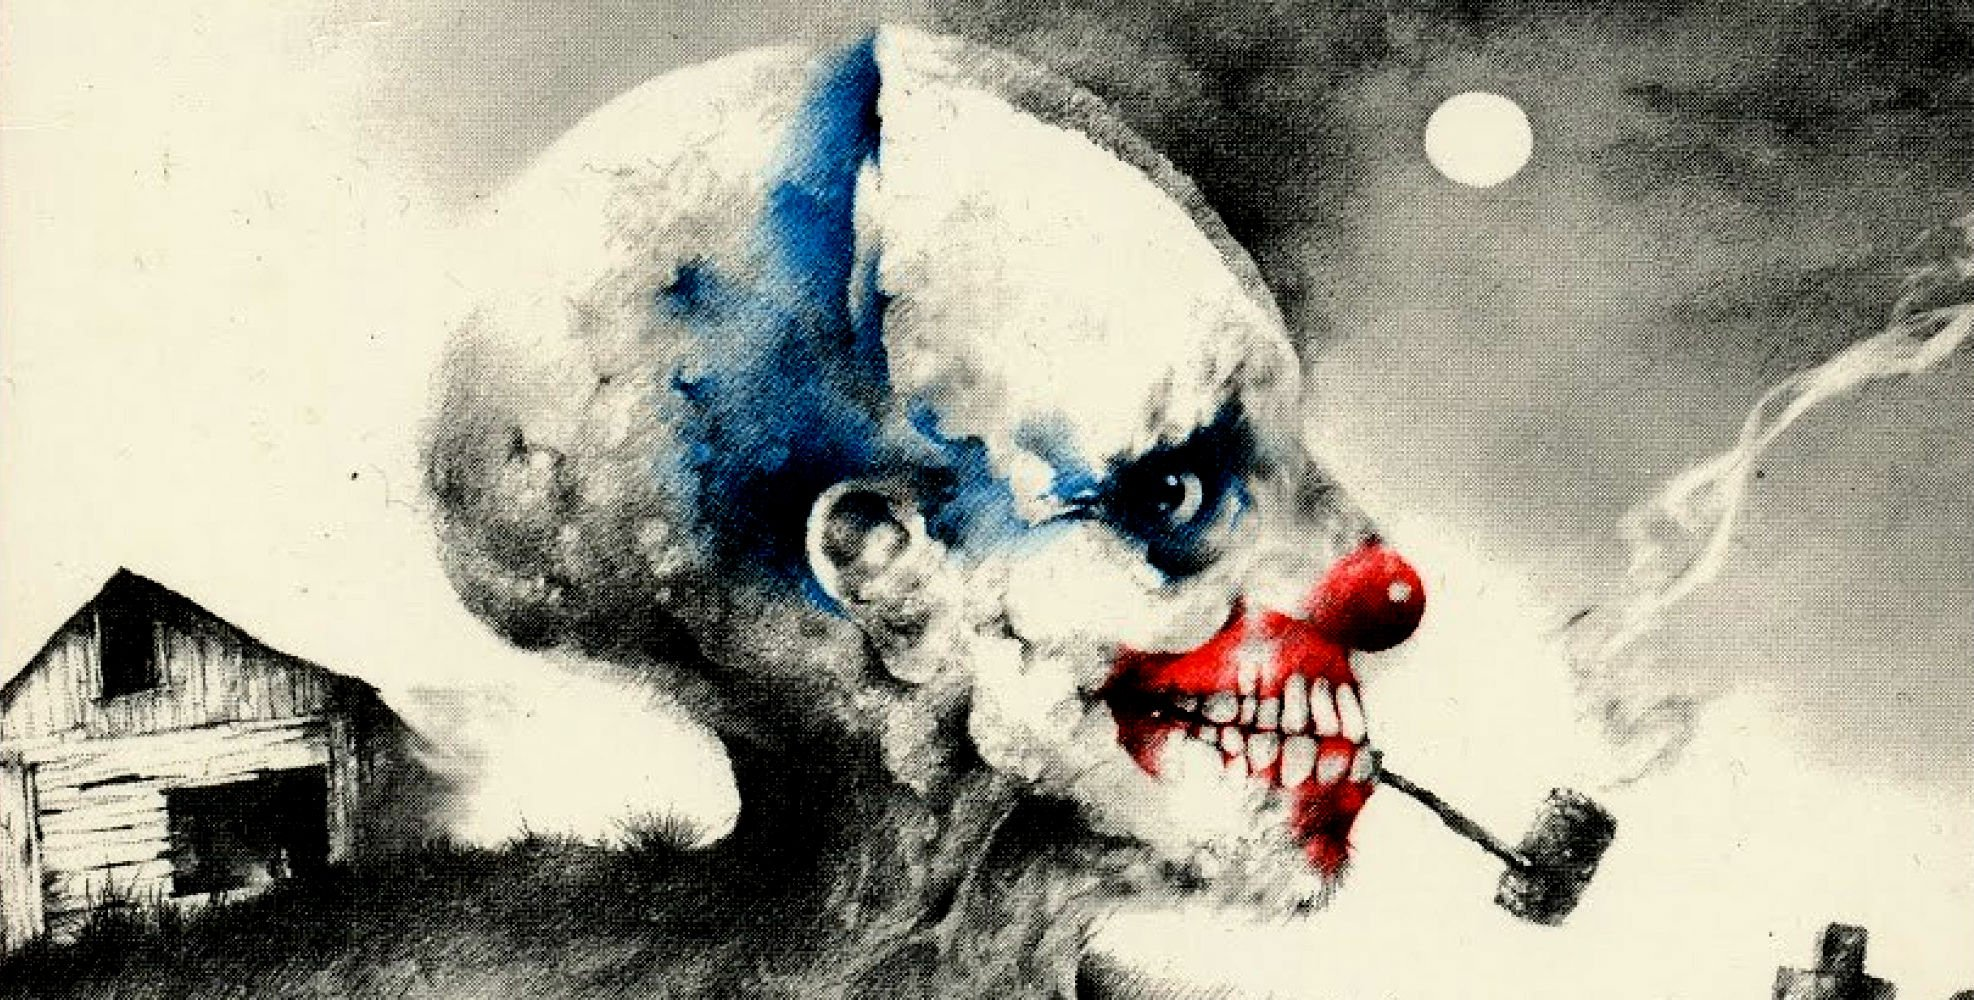 Horror Hd Wallpapers 1366x768 Dark Clown Artwork Painting Psychedelic Wallpaper